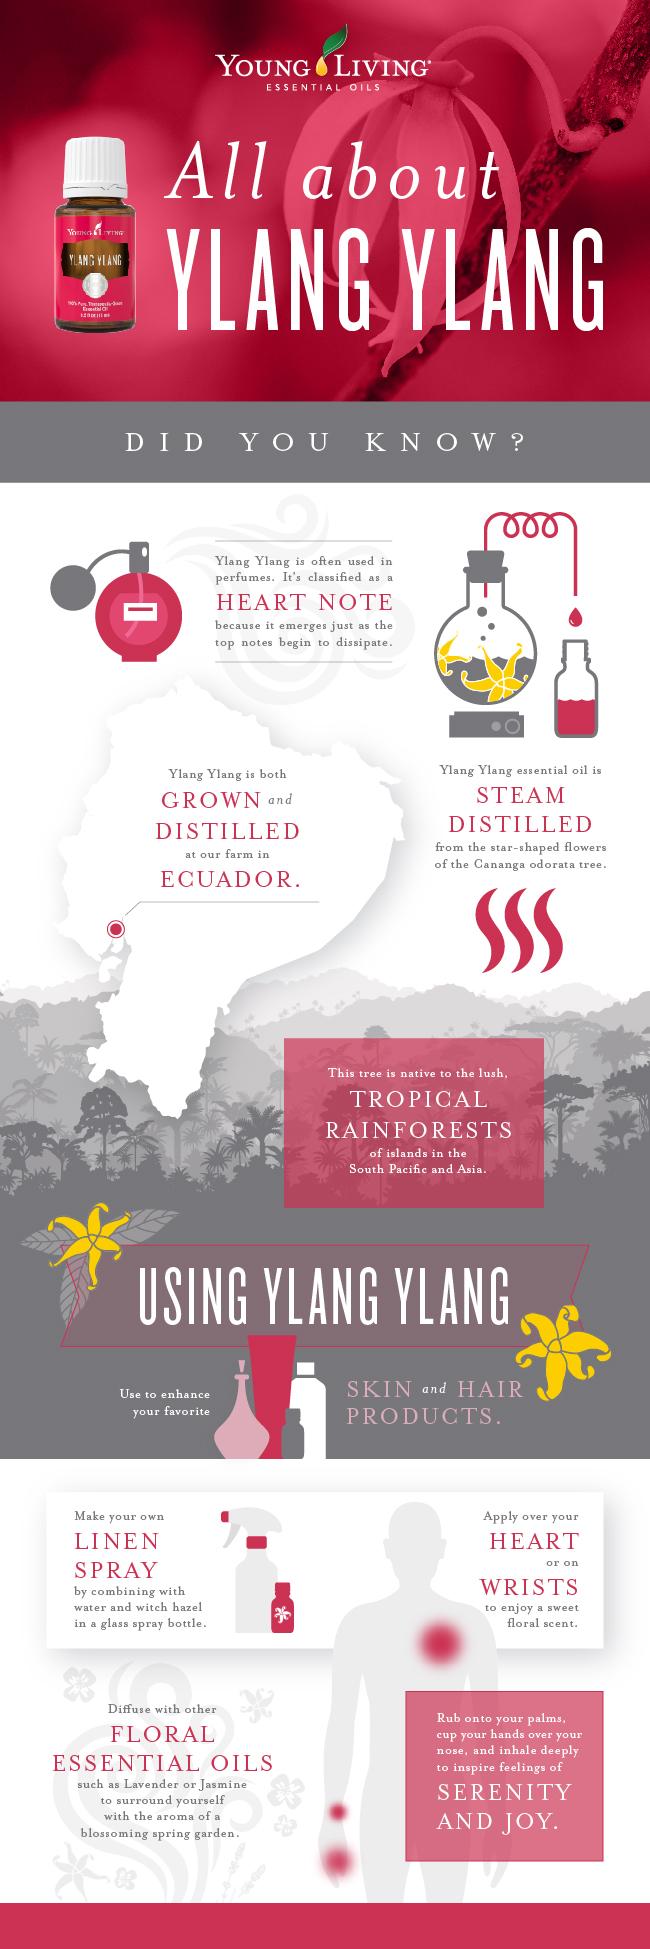 Ylang Ylang Oil Uses Young Living Blog